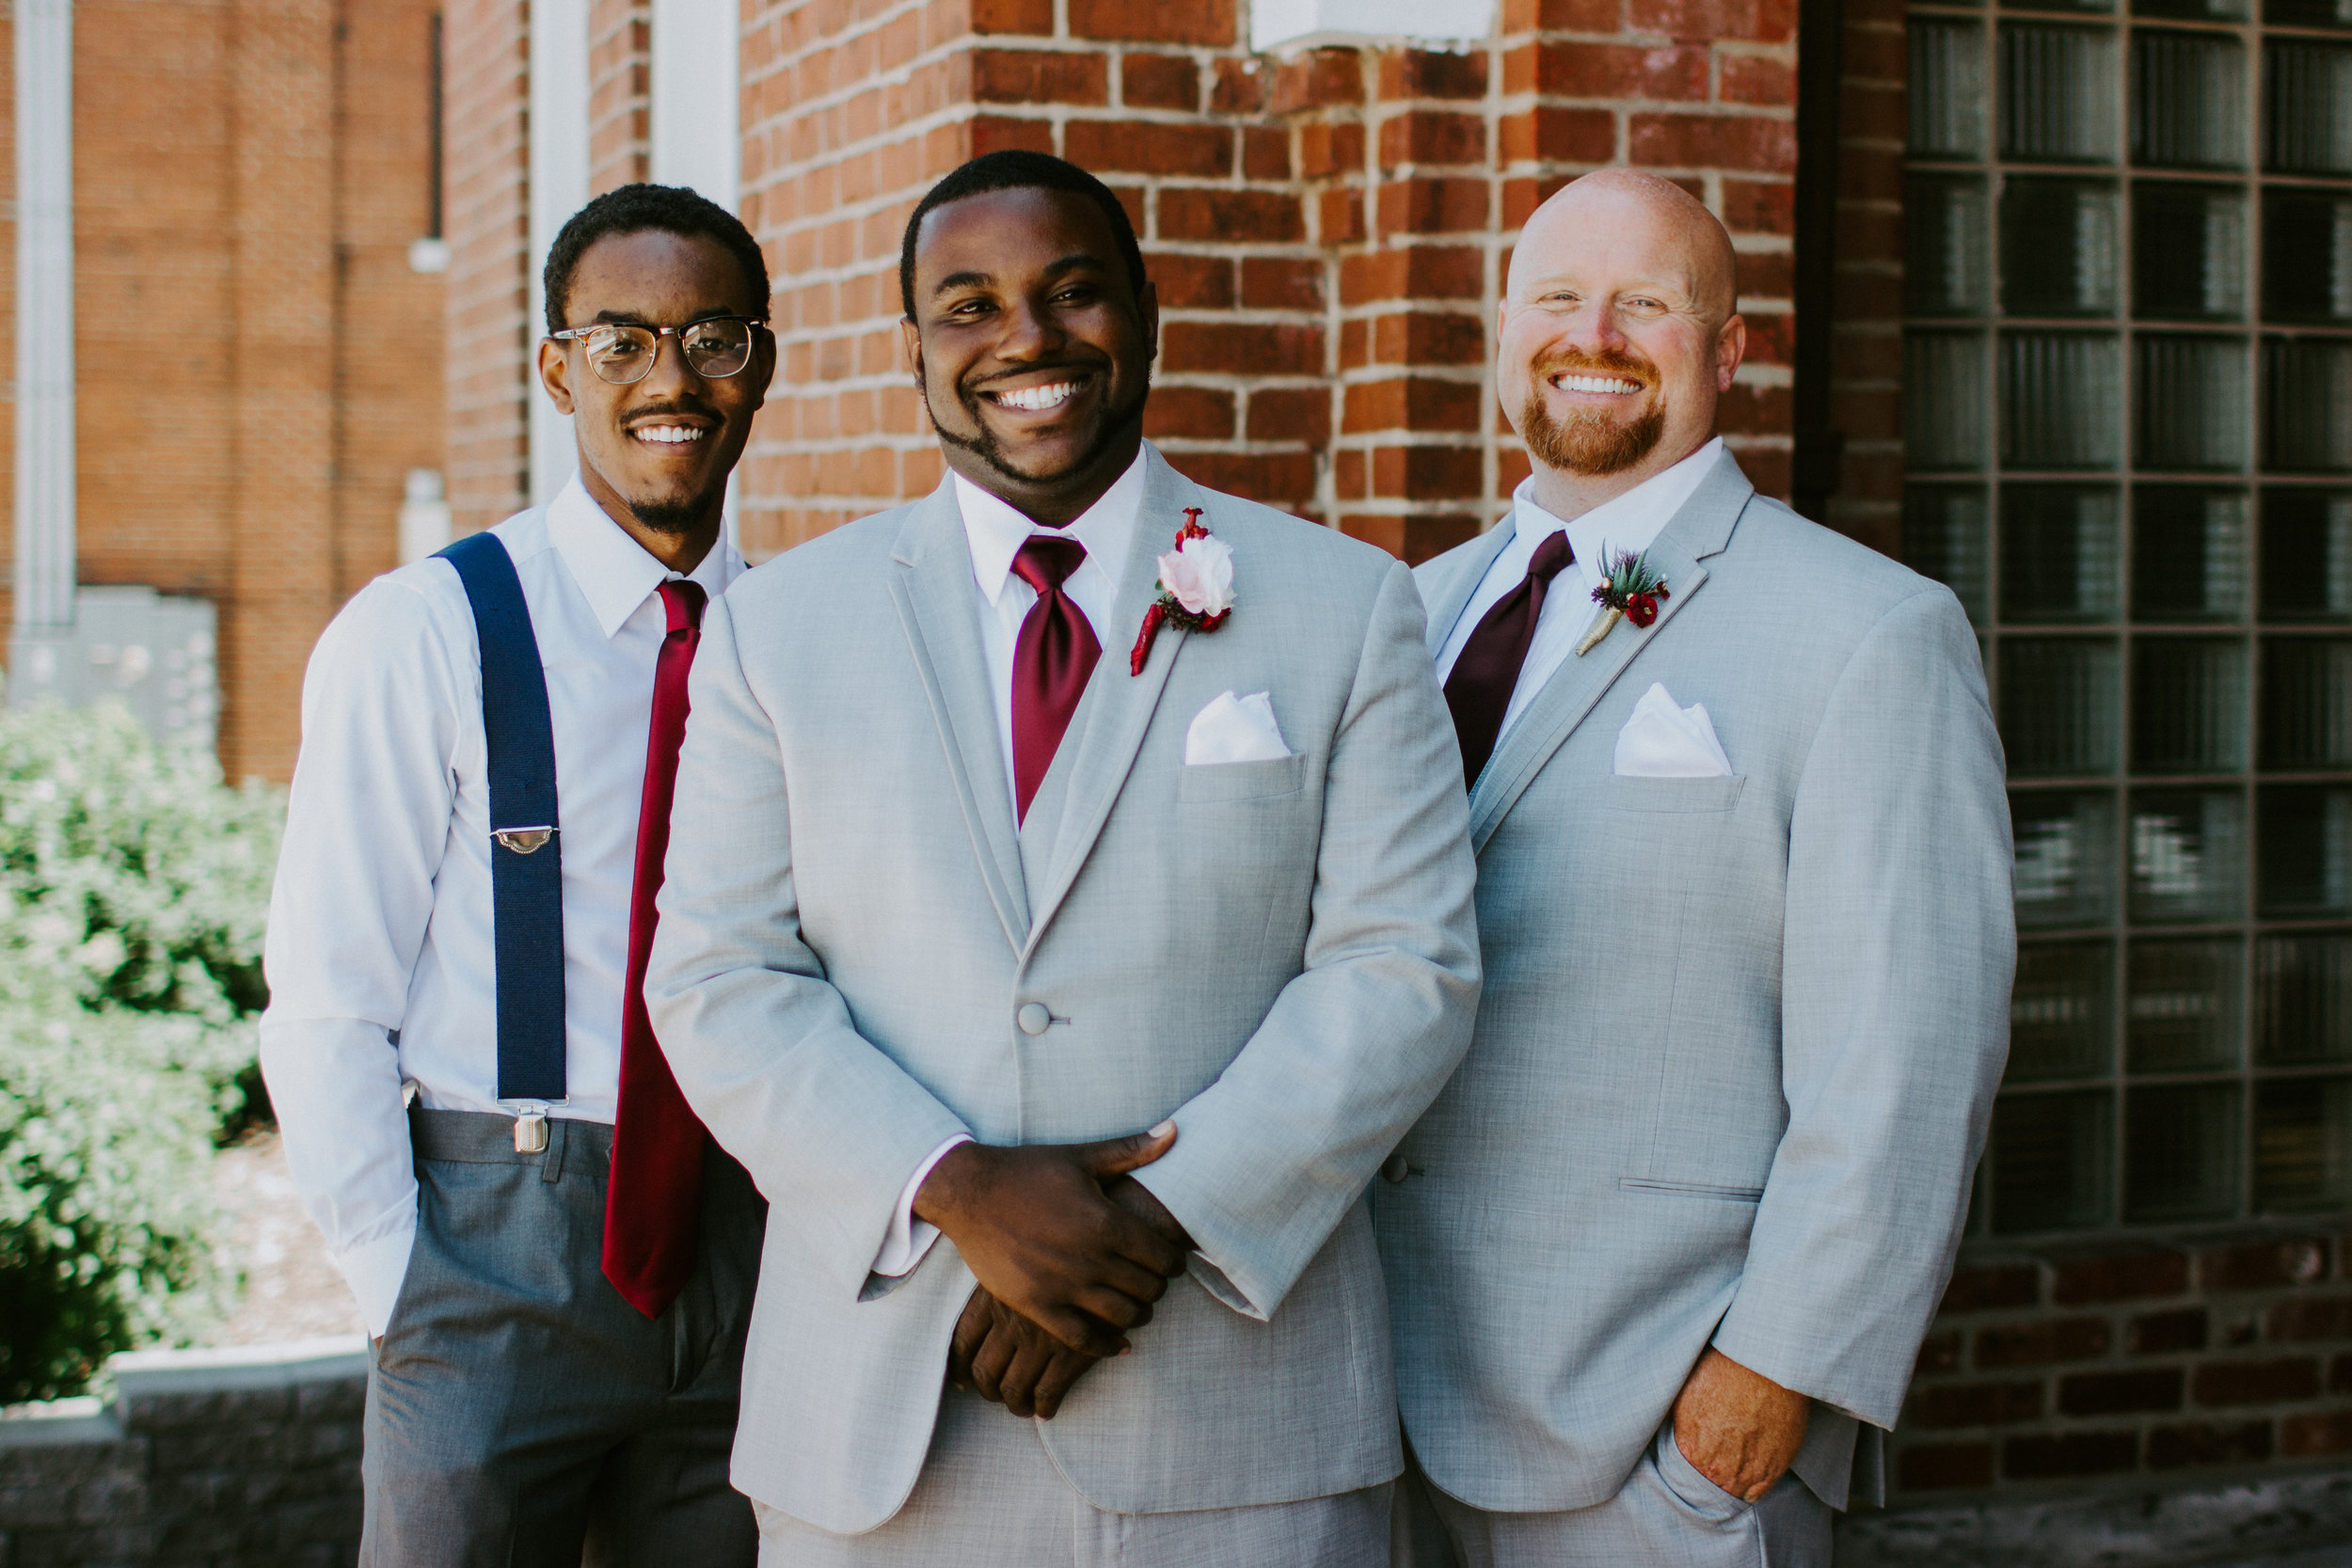 WonderlyCreative_Wedding_6.7.18_Khara&Dwayne_-302.jpg